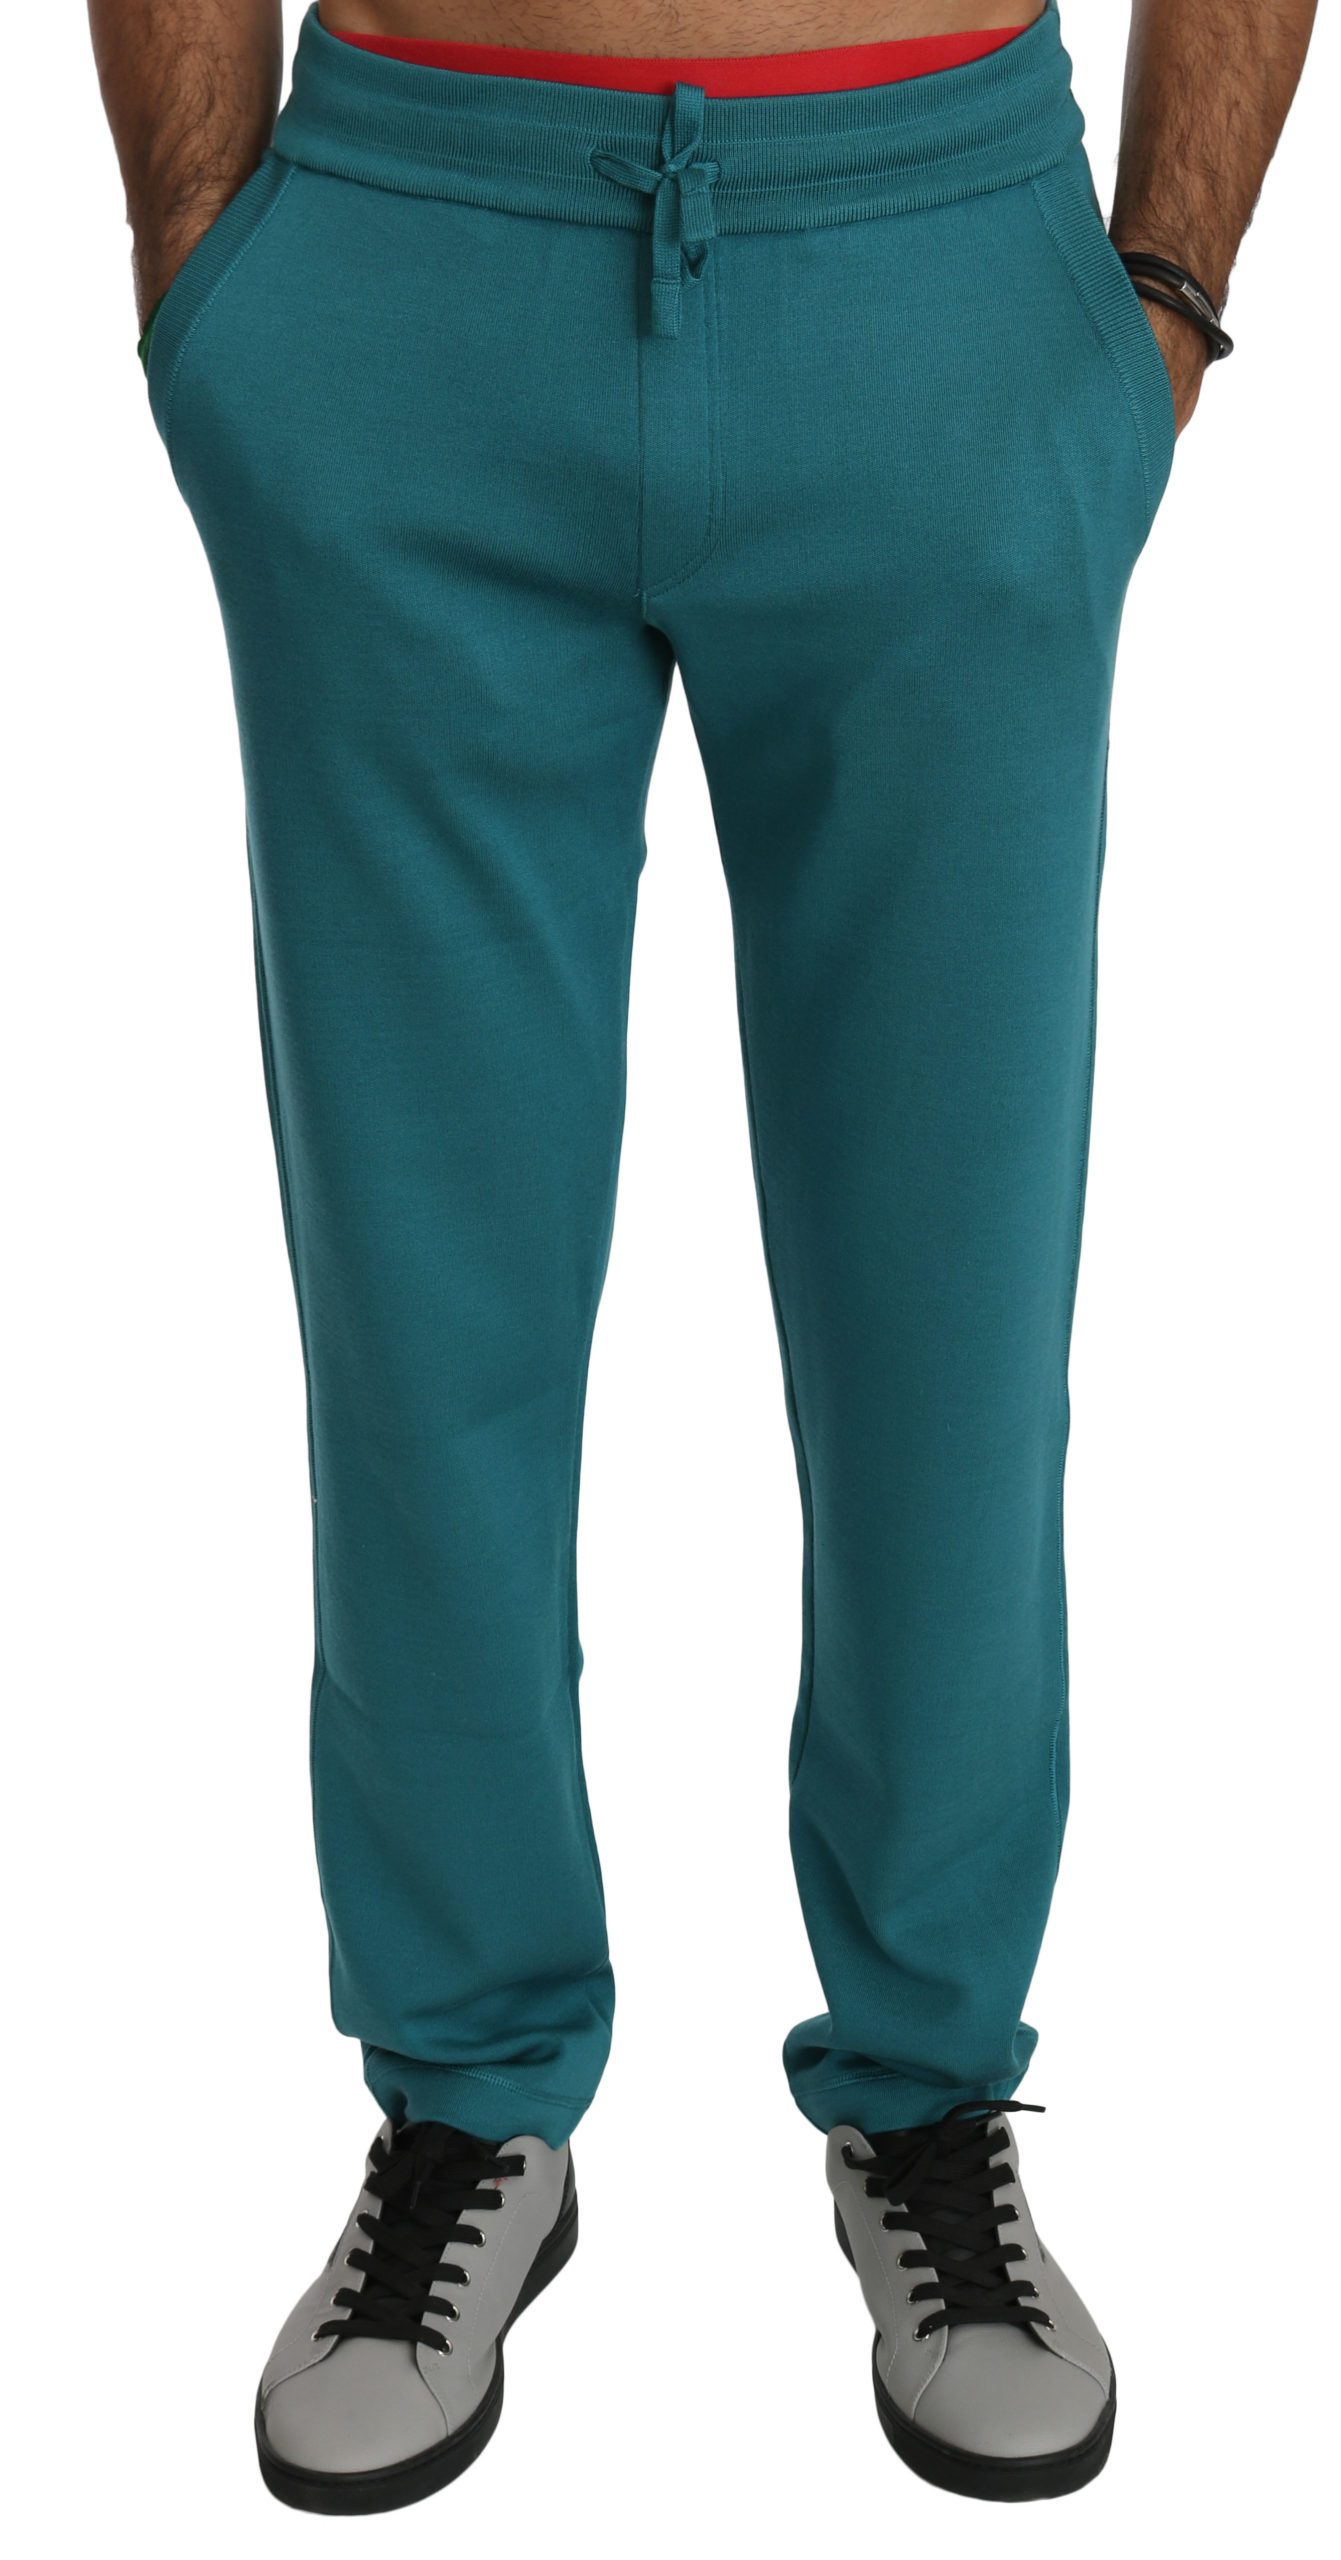 Dolce & Gabbana Men's Silk Sweatpants Sport Trouser Blue PAN70751 - M